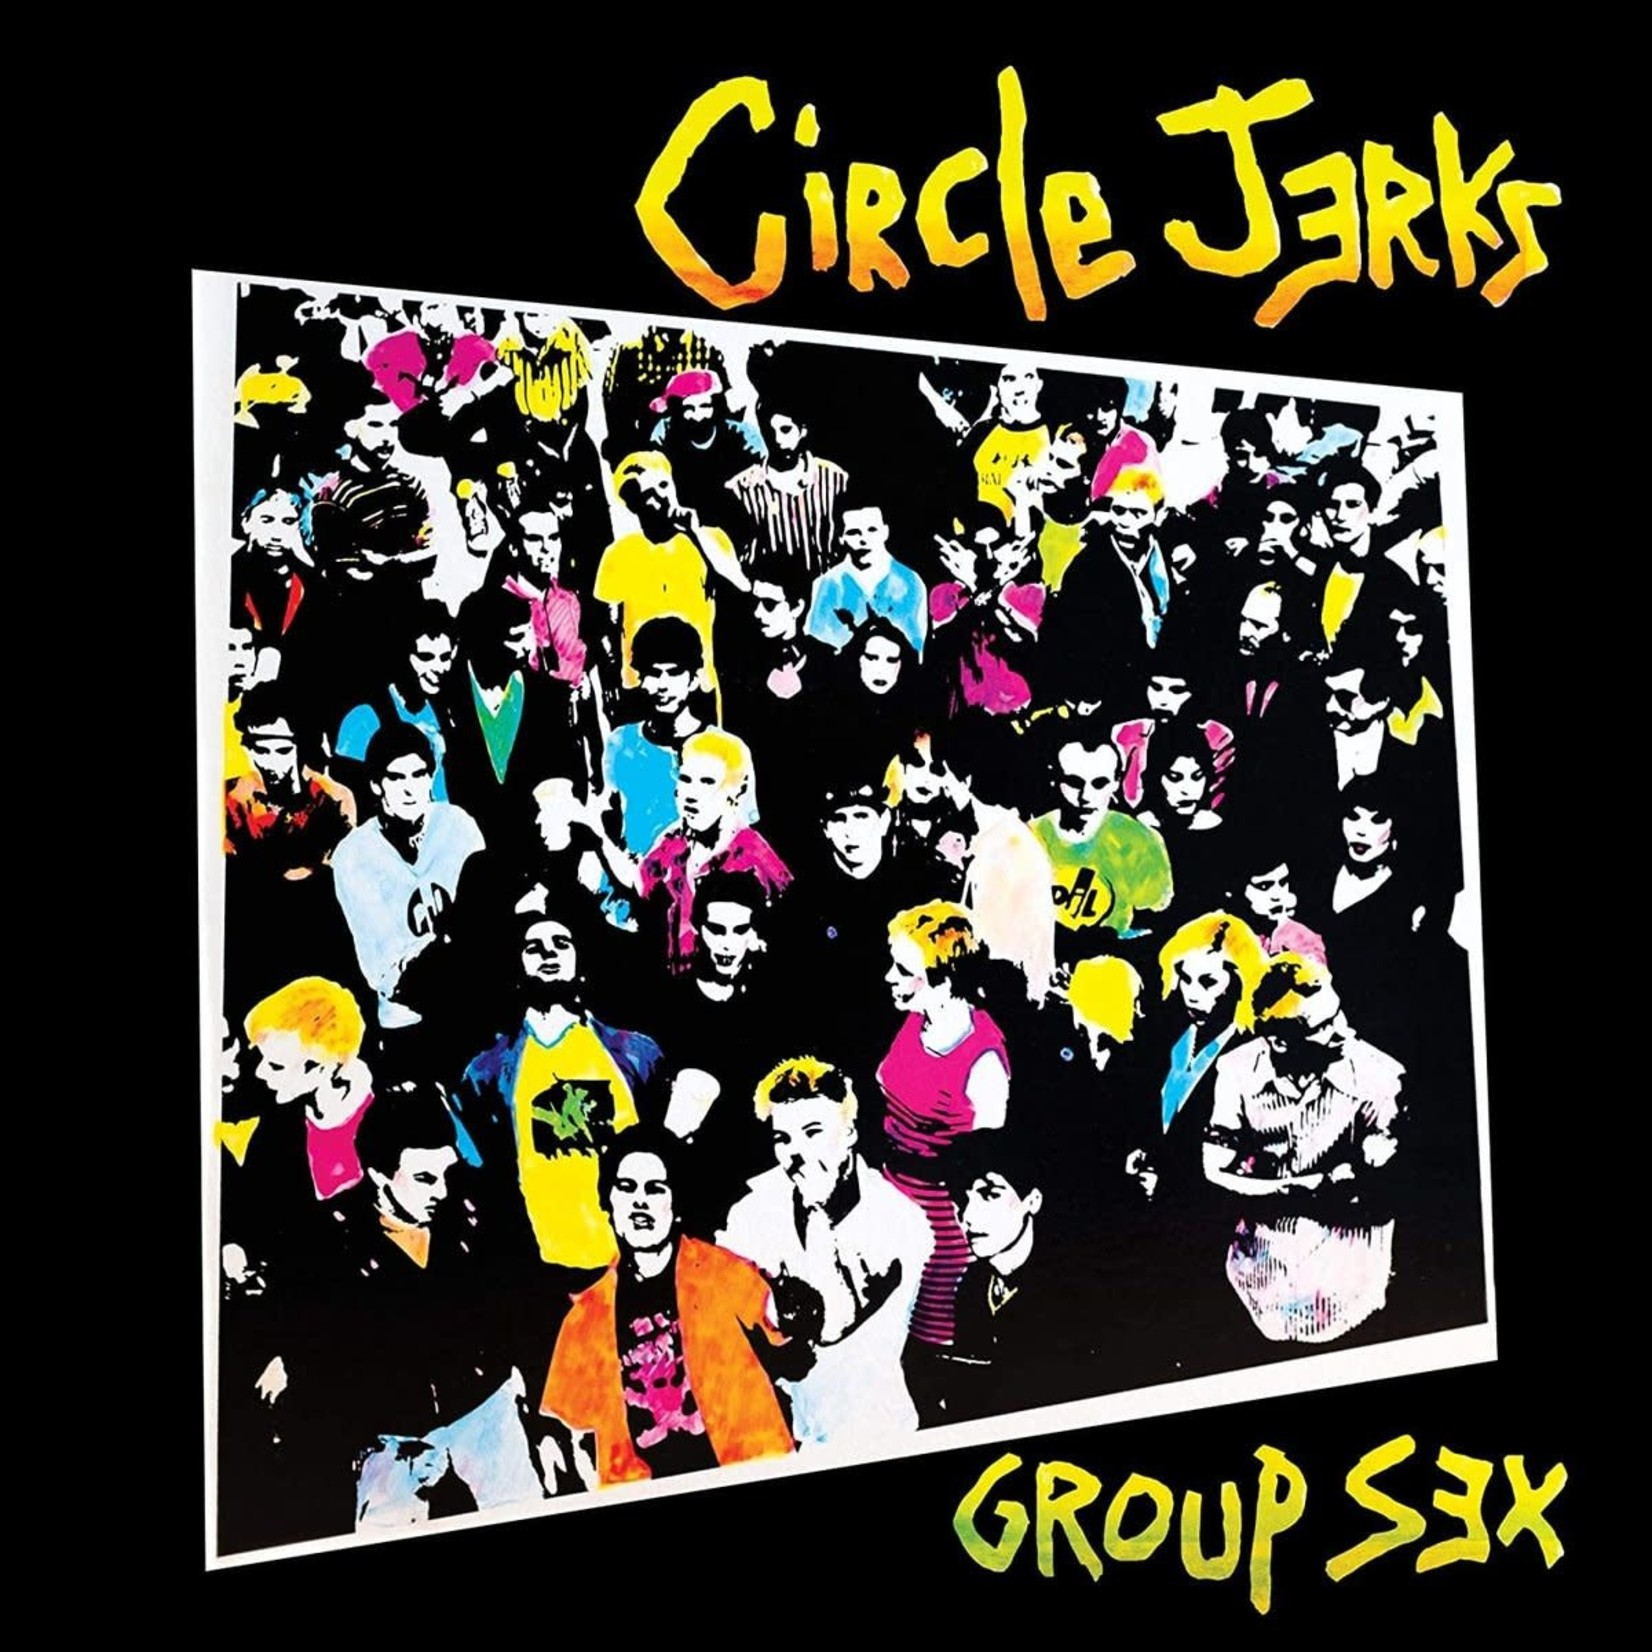 [New] Circle Jerks: Group Sex (40th Anniversary Ed., yellow vinyl)